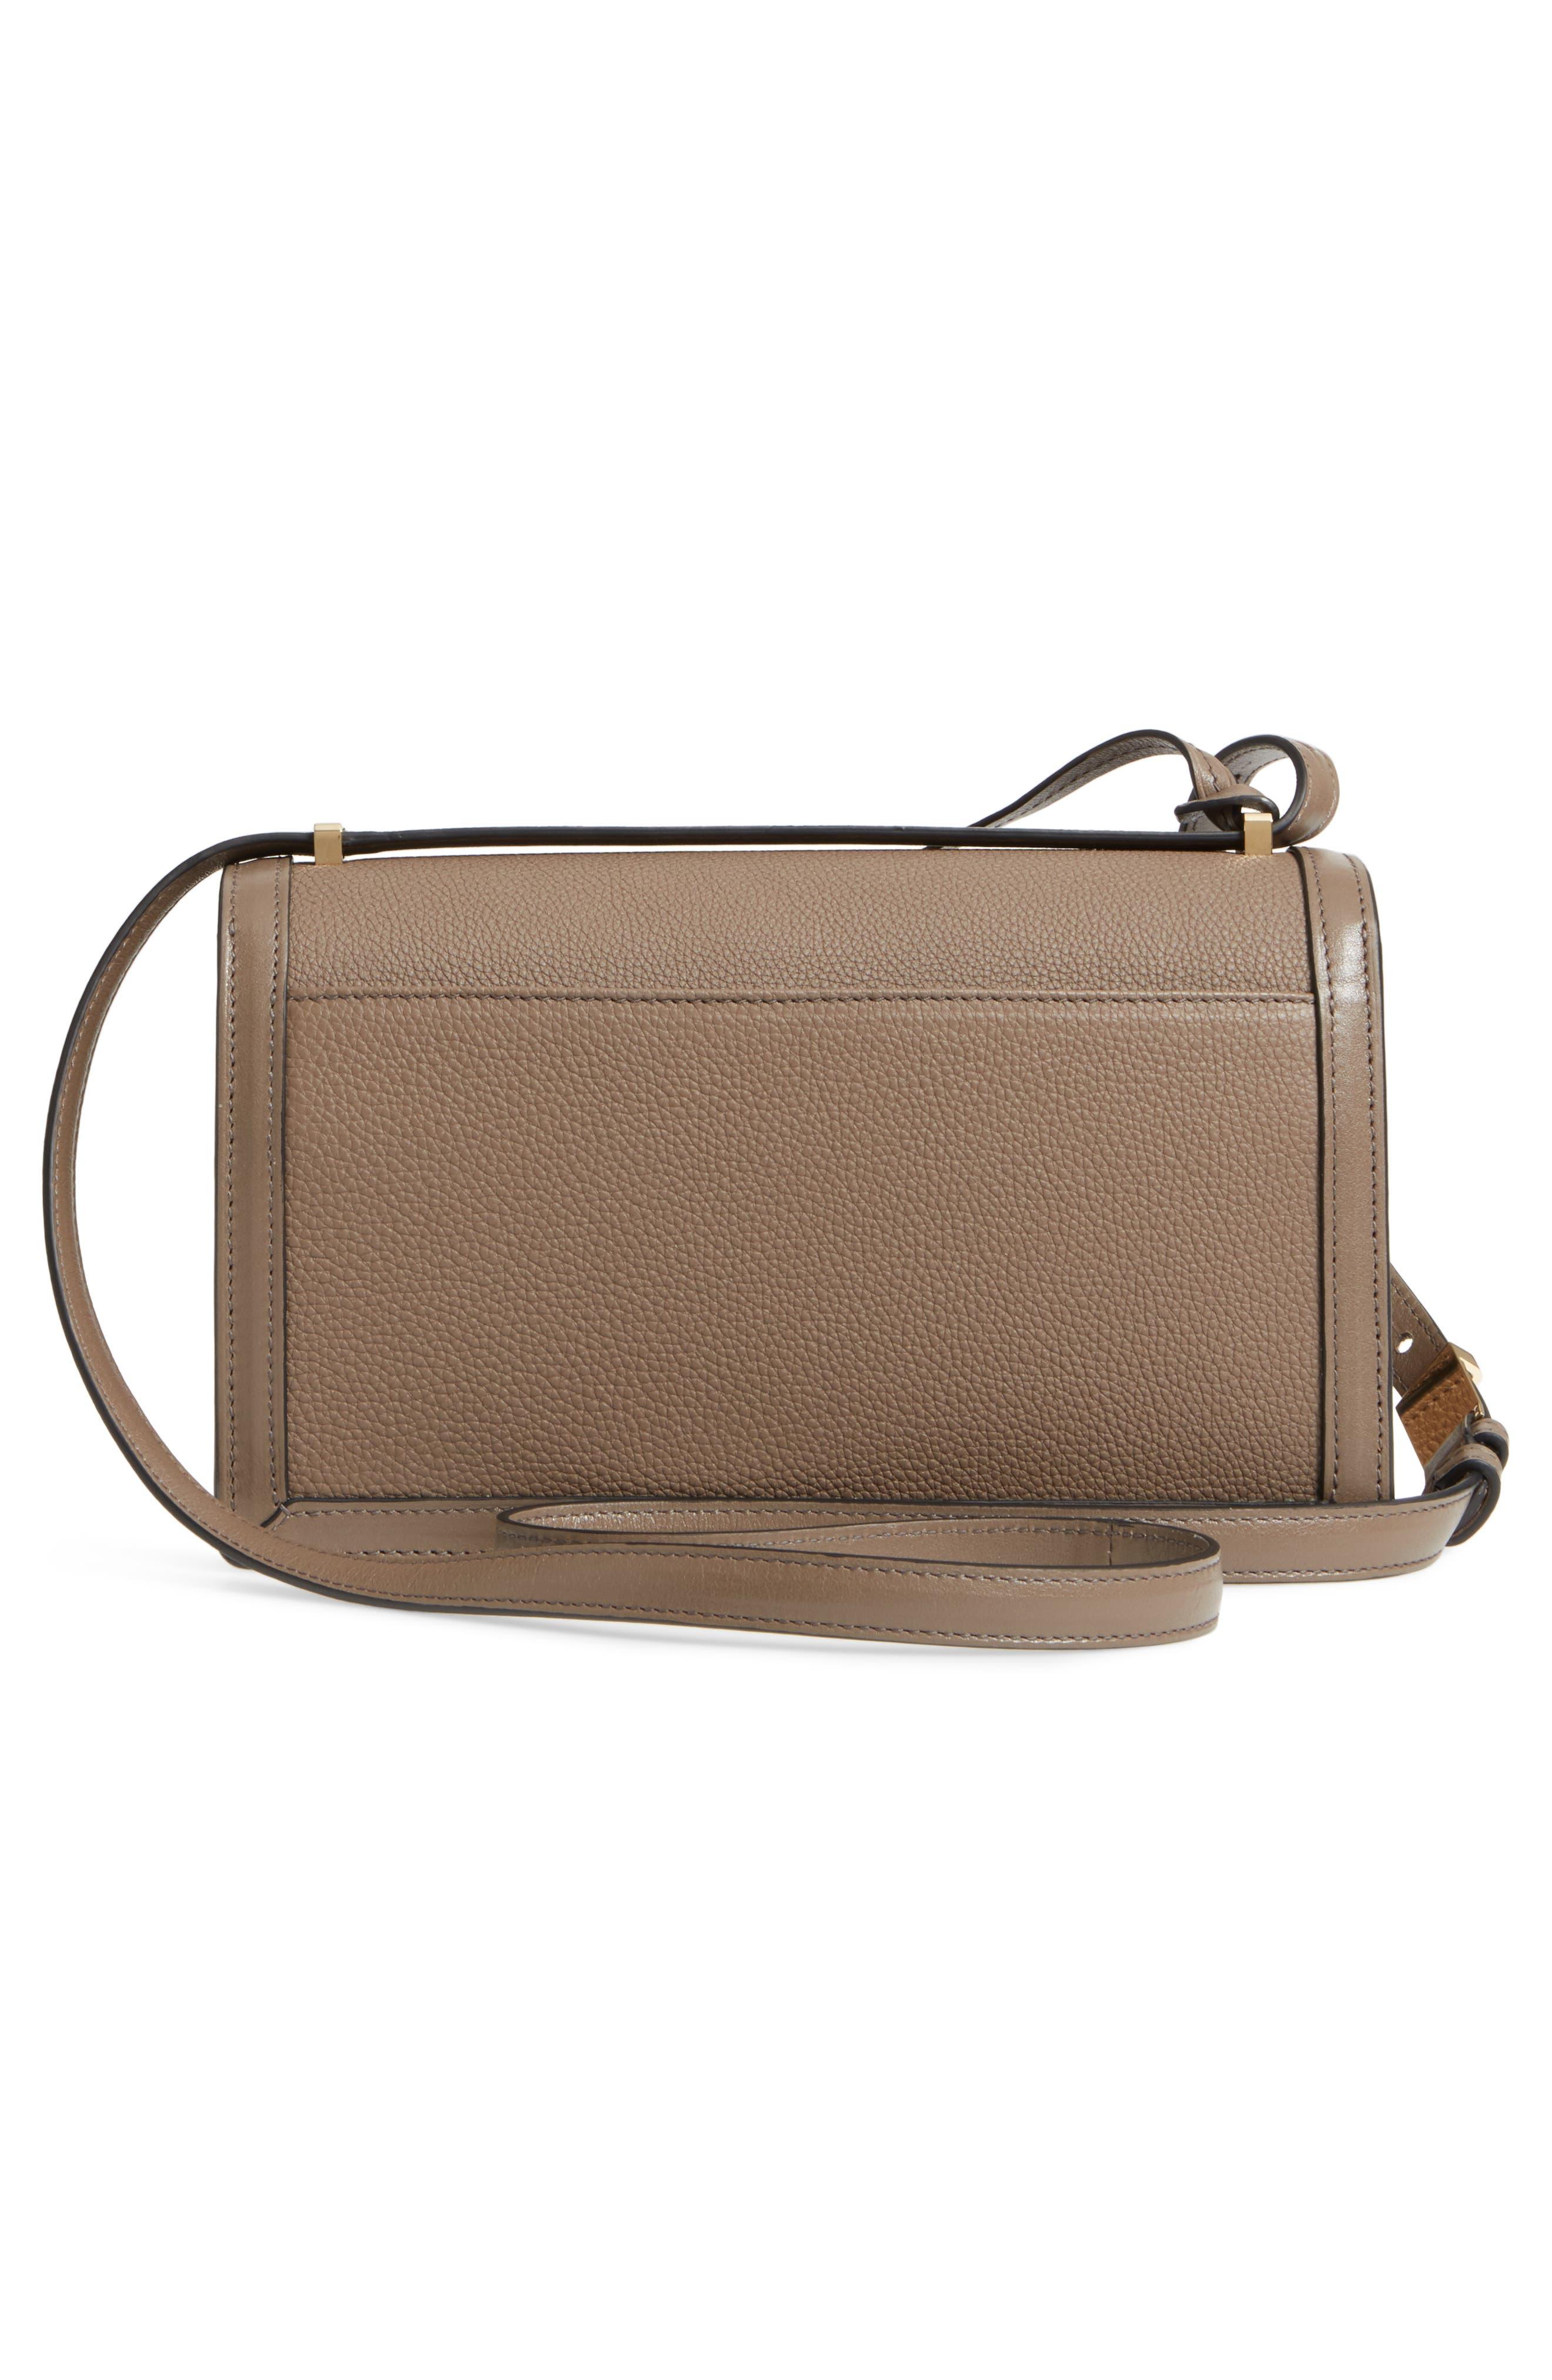 Medium Barcelona Leather Crossbody Bag,                             Alternate thumbnail 3, color,